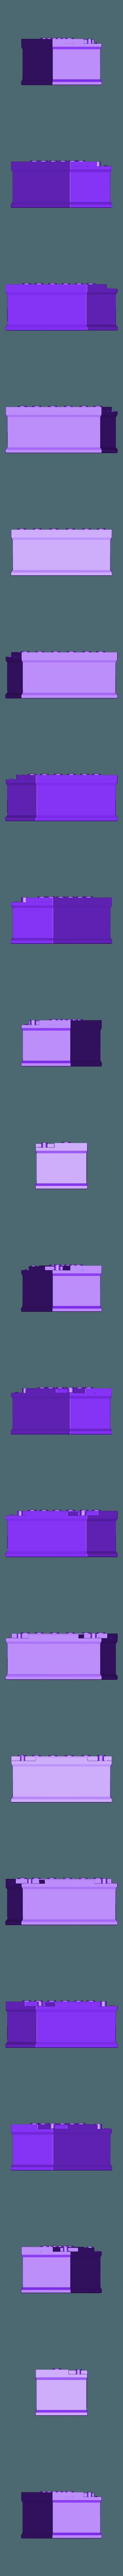 batterie.obj Download OBJ file car battery • 3D print design, baudrymichael